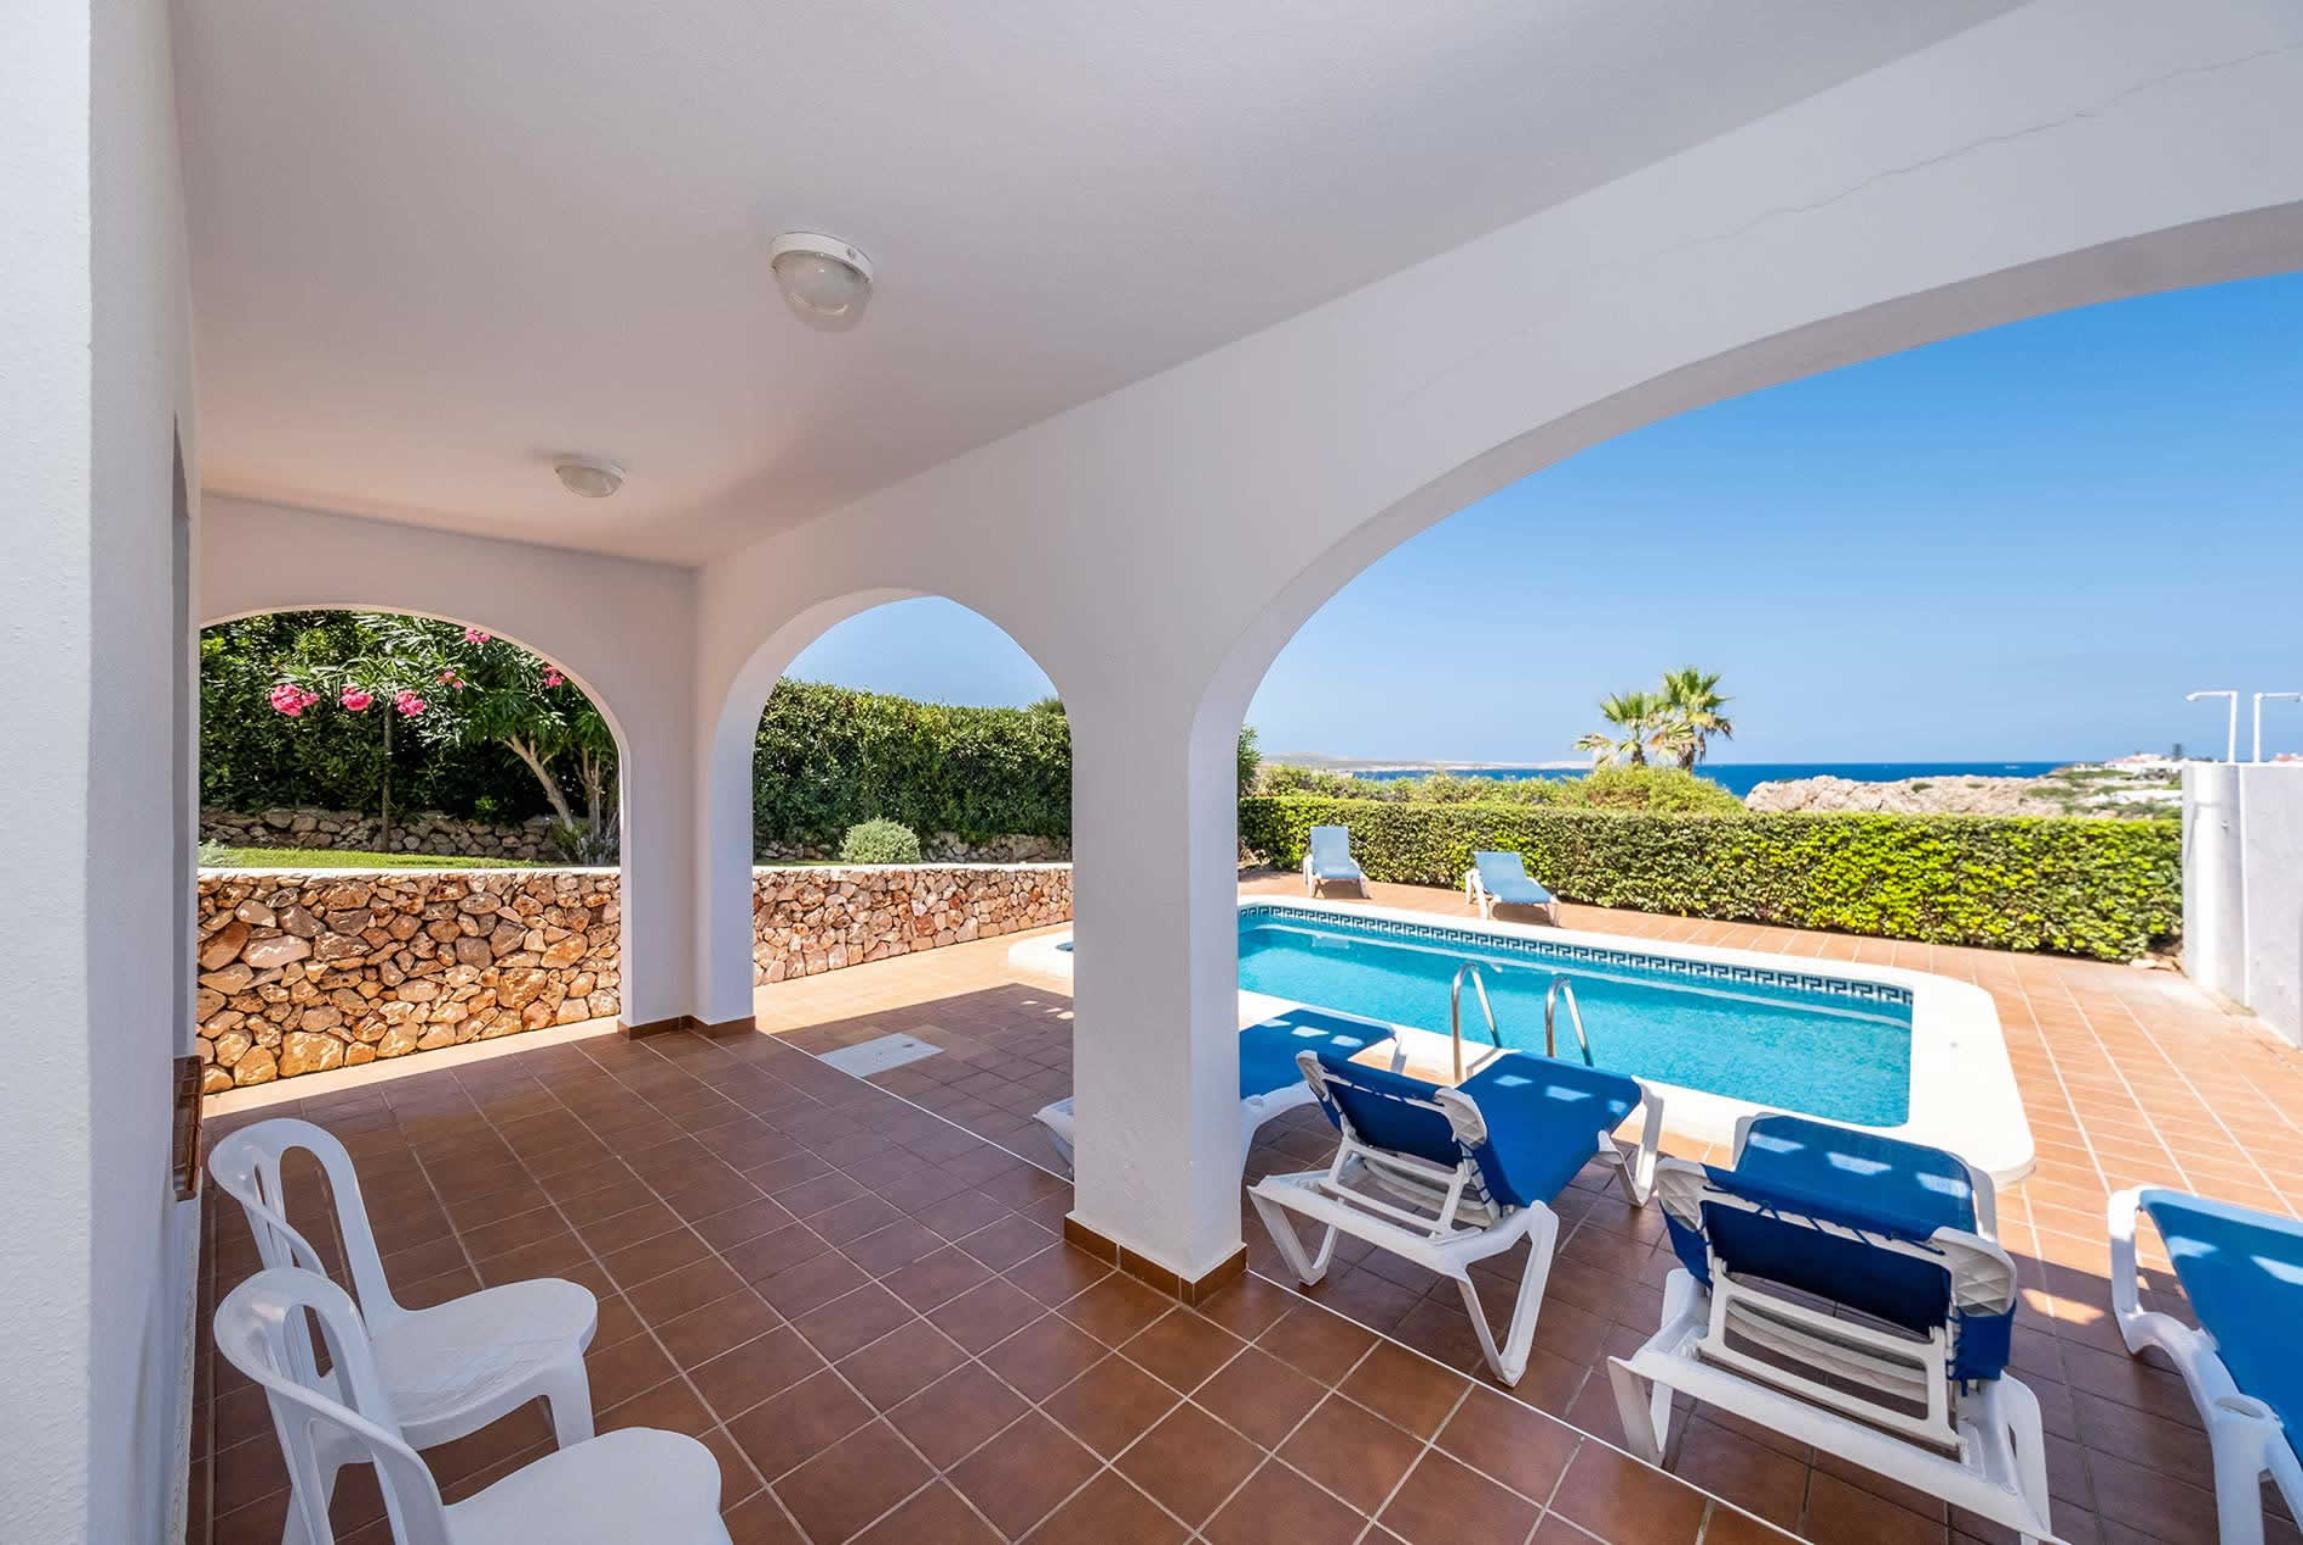 Ferienhaus Bellavista I (2654269), Arenal De'N Castell, Menorca, Balearische Inseln, Spanien, Bild 21